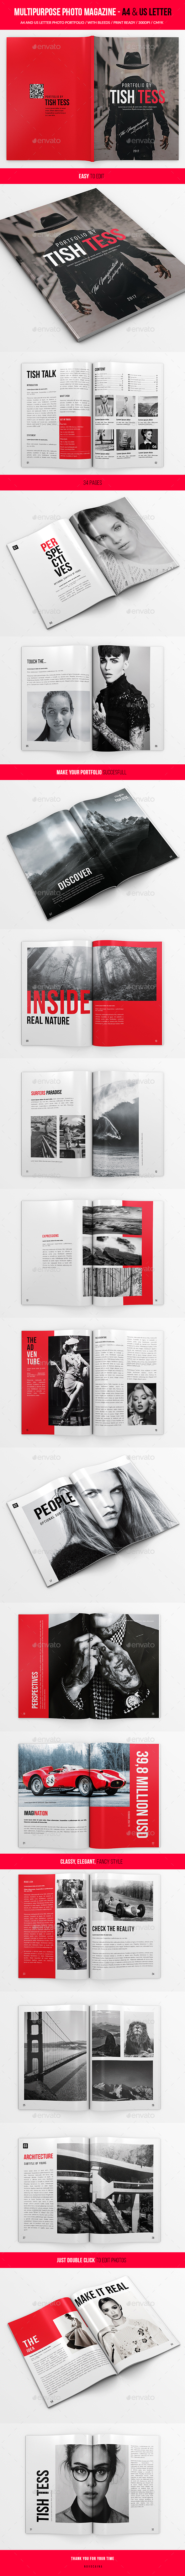 Multipurpose Photo Portfolio - US Letter and A4 - 34pgs - Portfolio Brochures